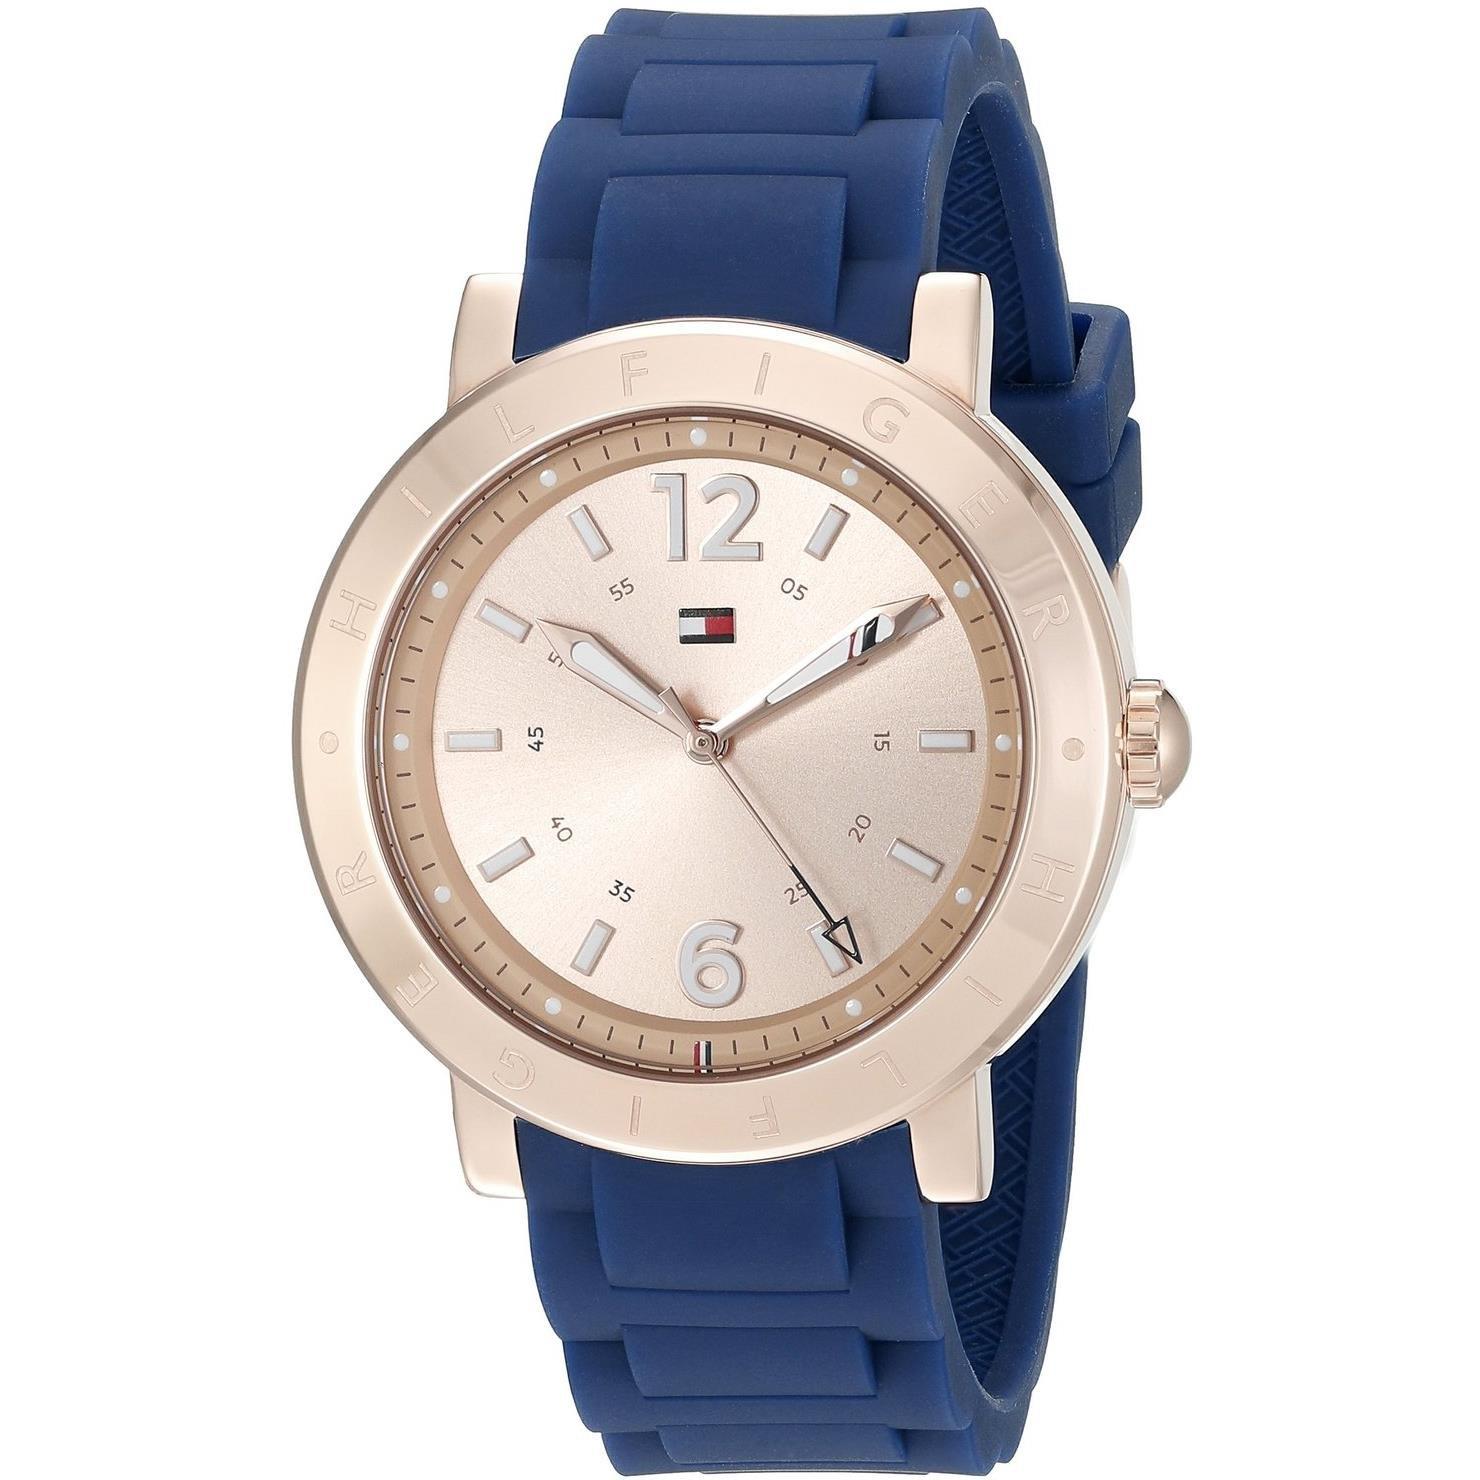 Amazon.com: RELOJ TOMMY HILFIGER 1781617 MUJER: Watches